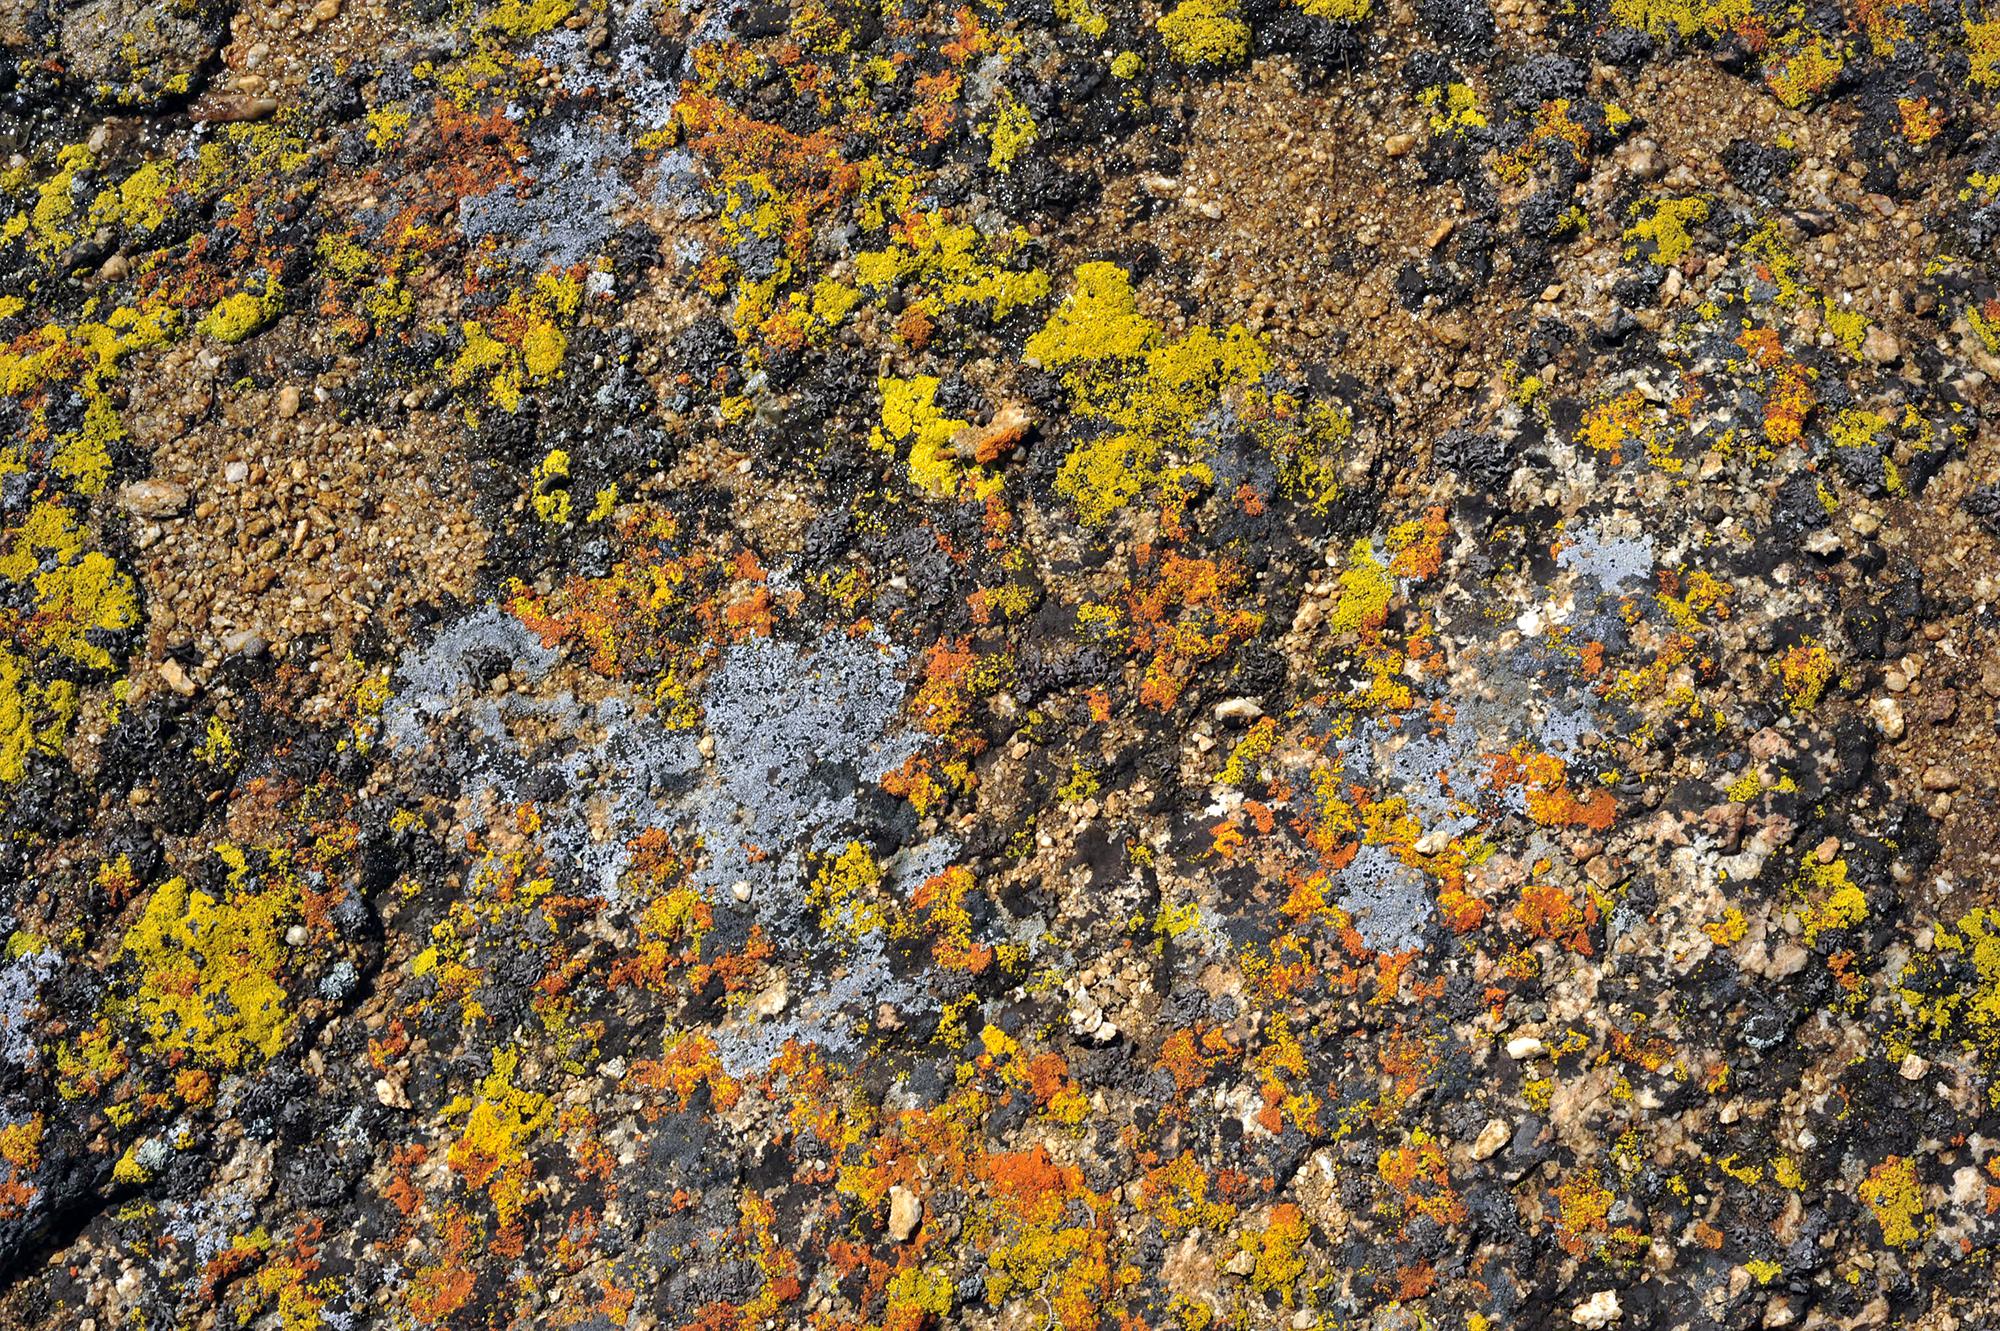 Lichen growing on a Rock